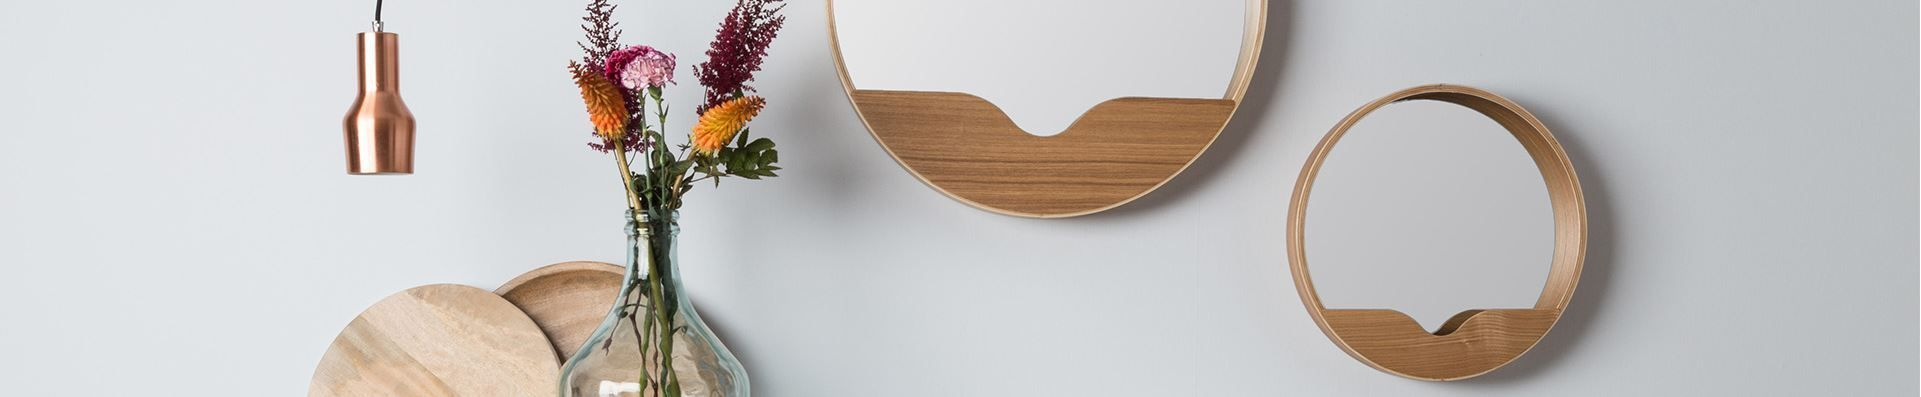 Materialtrend Holz: Light Wood